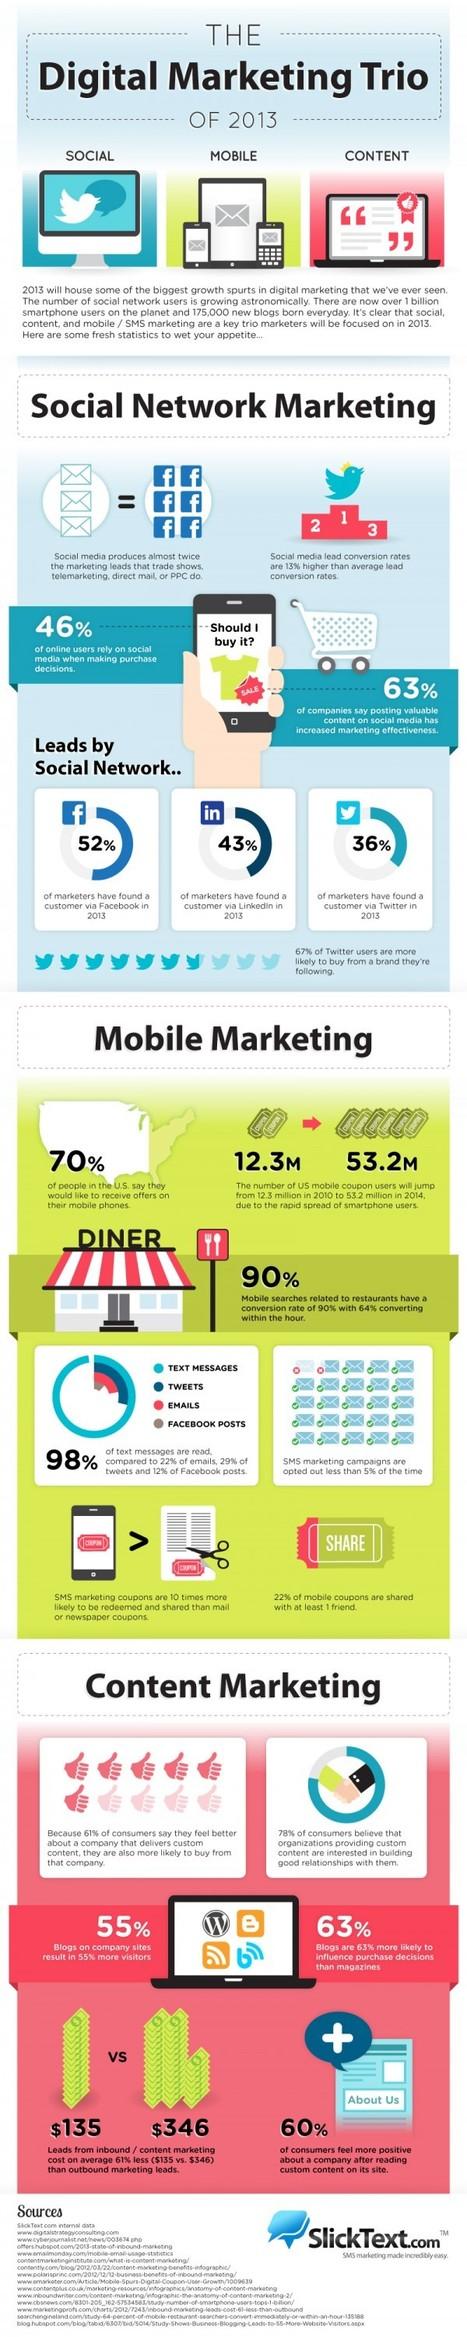 [INFOGRAPHIC] Le trio marketing digital de 2013: Social, Mobile, Content | Digital & Mobile Marketing Toolkit | Scoop.it